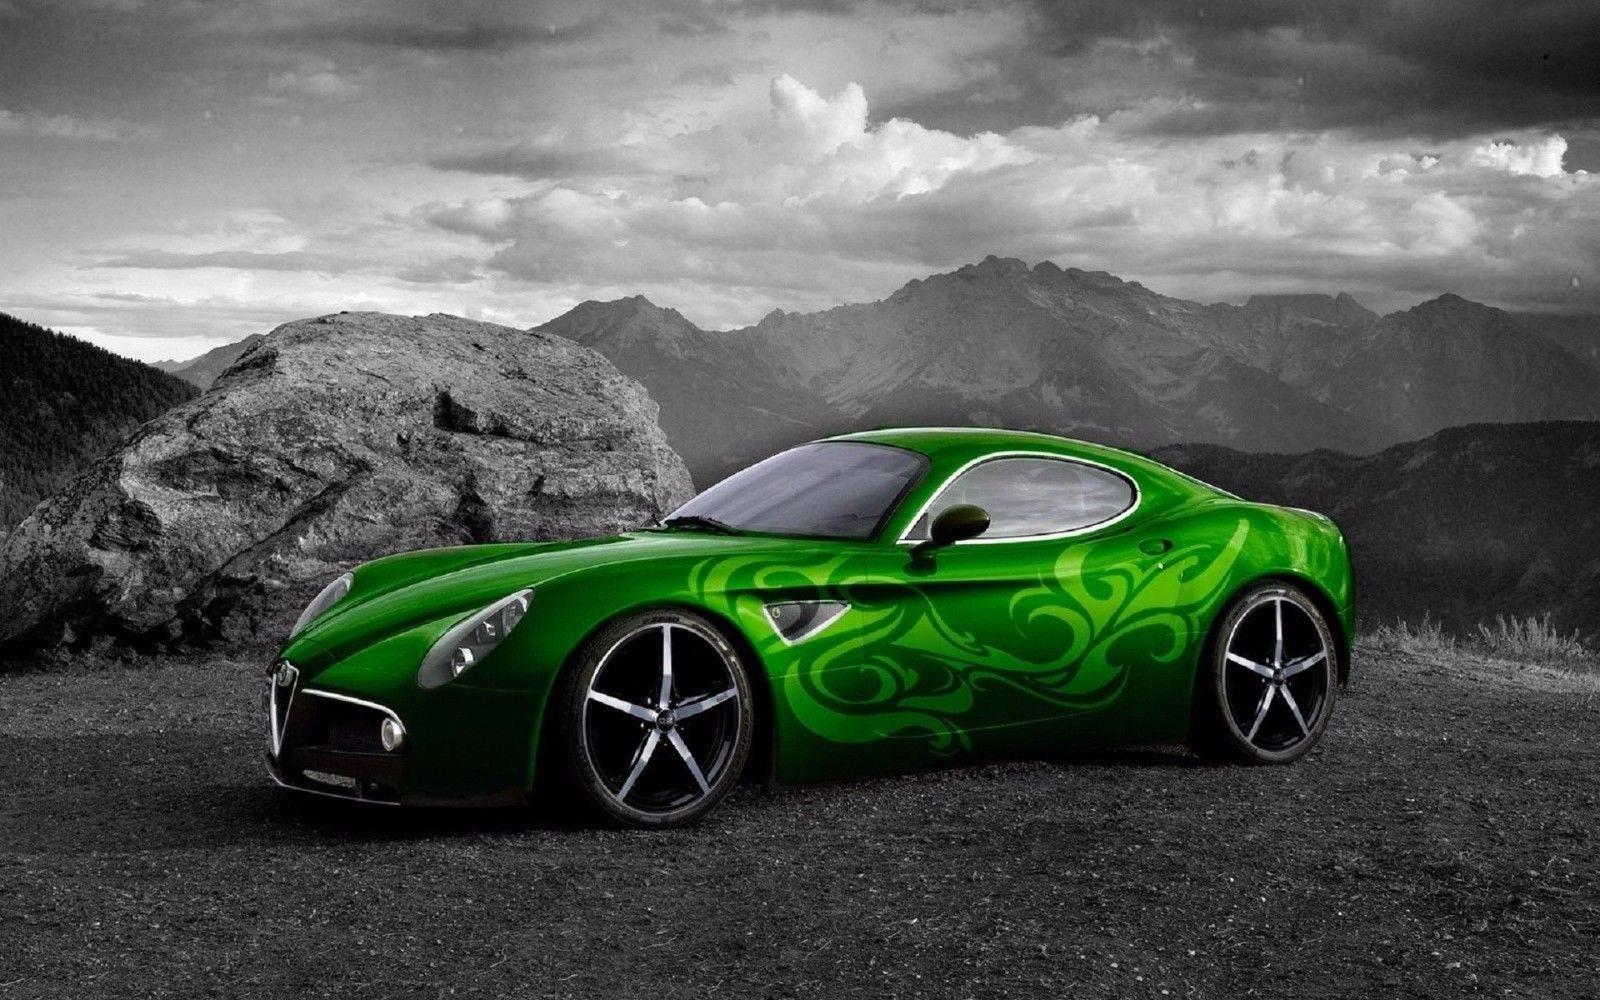 126825 verde Alfa Romeo Decor WALL PRINT POSTER AU